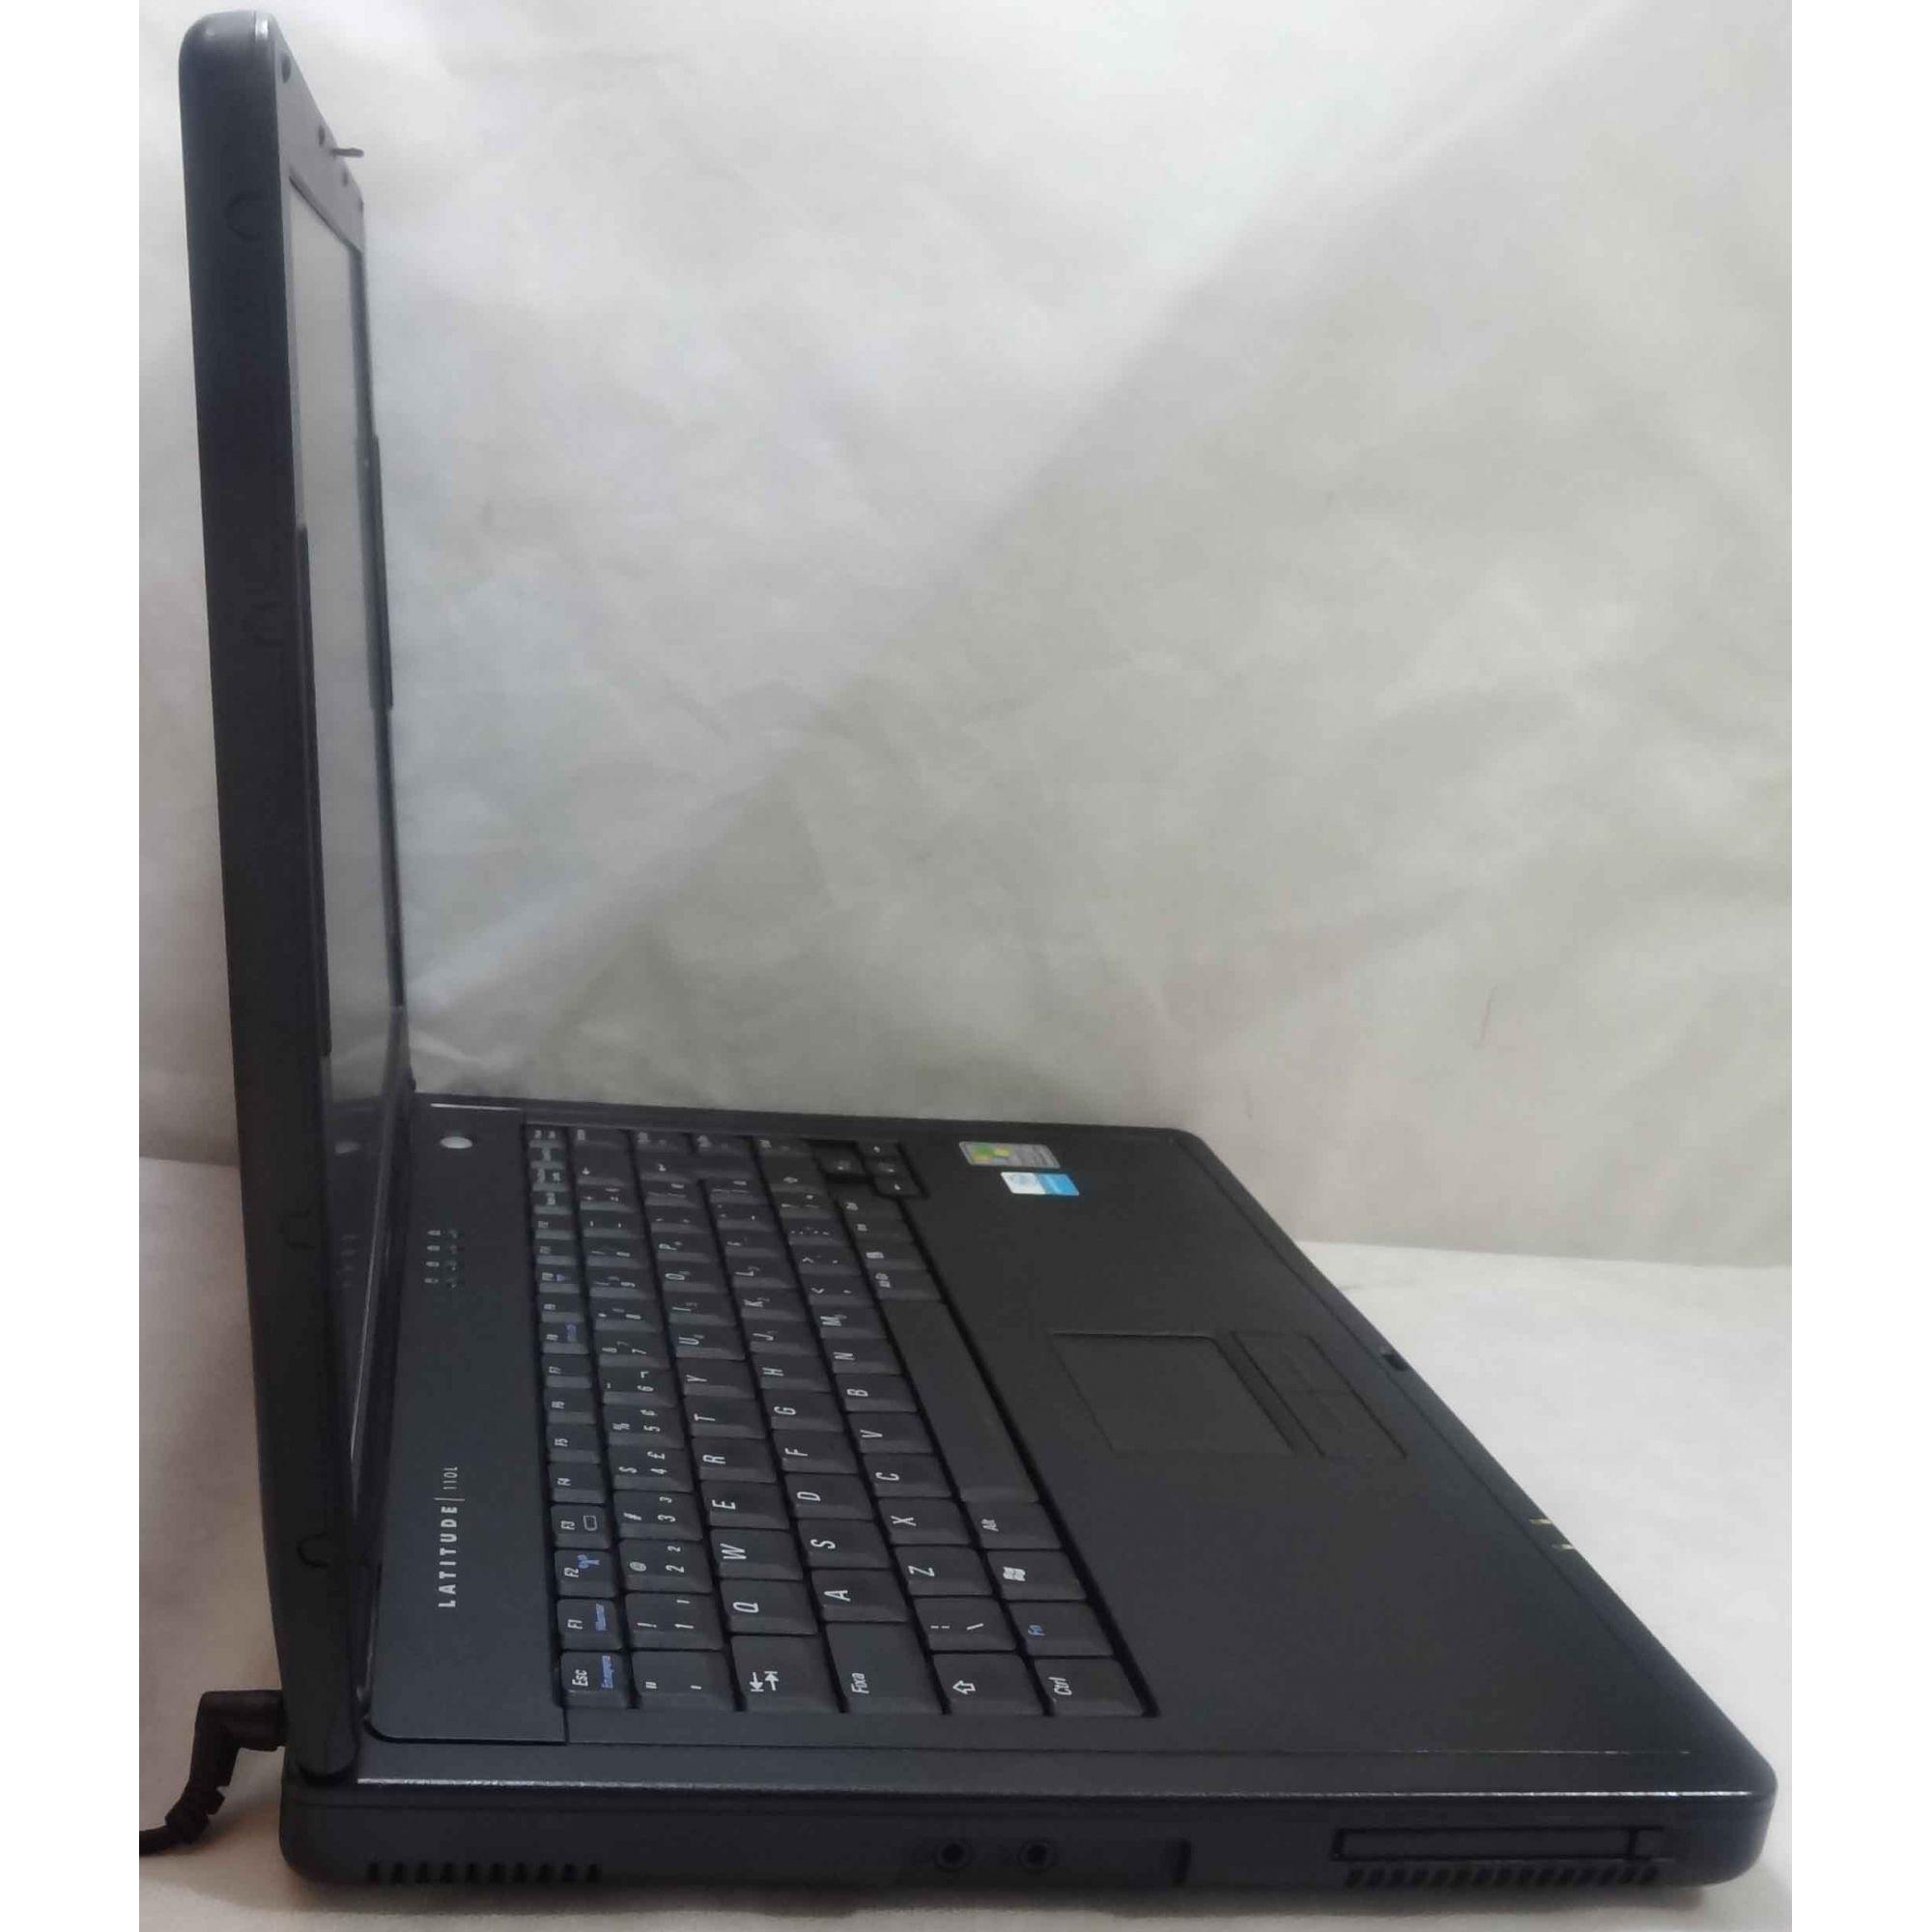 Dell Latitude 110L 14'' Intel Pentium 1.6GHz 2GB HD-40GB